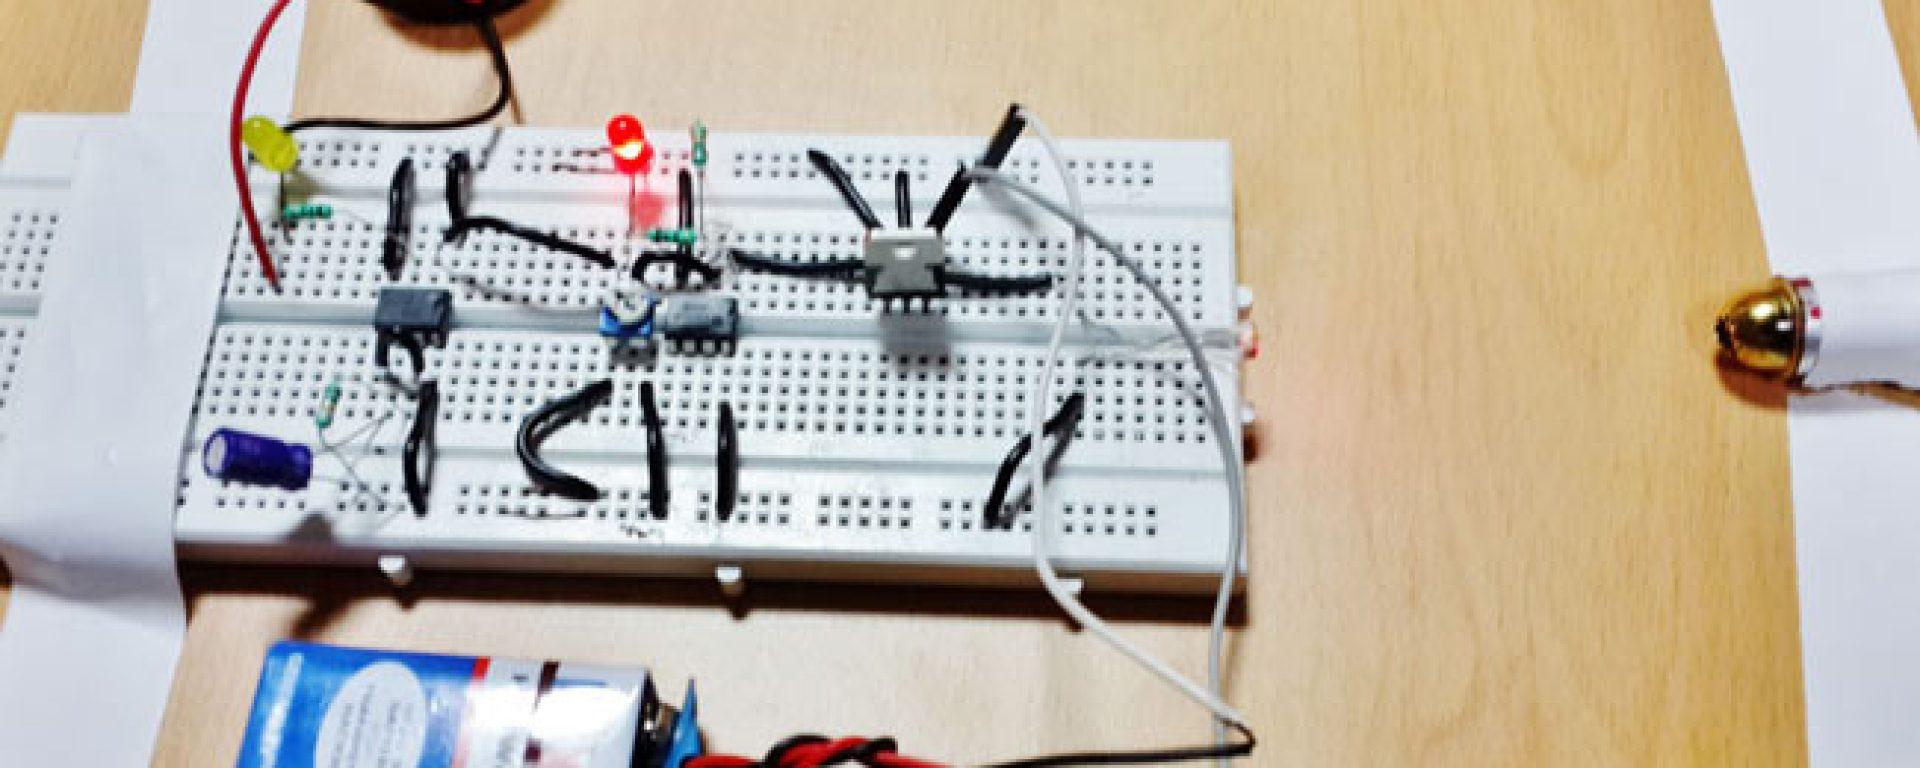 Laser Security Alarm Circuit Technology Hacking Pirsensorbasedsecurityalarmcircuitdiagramjpg